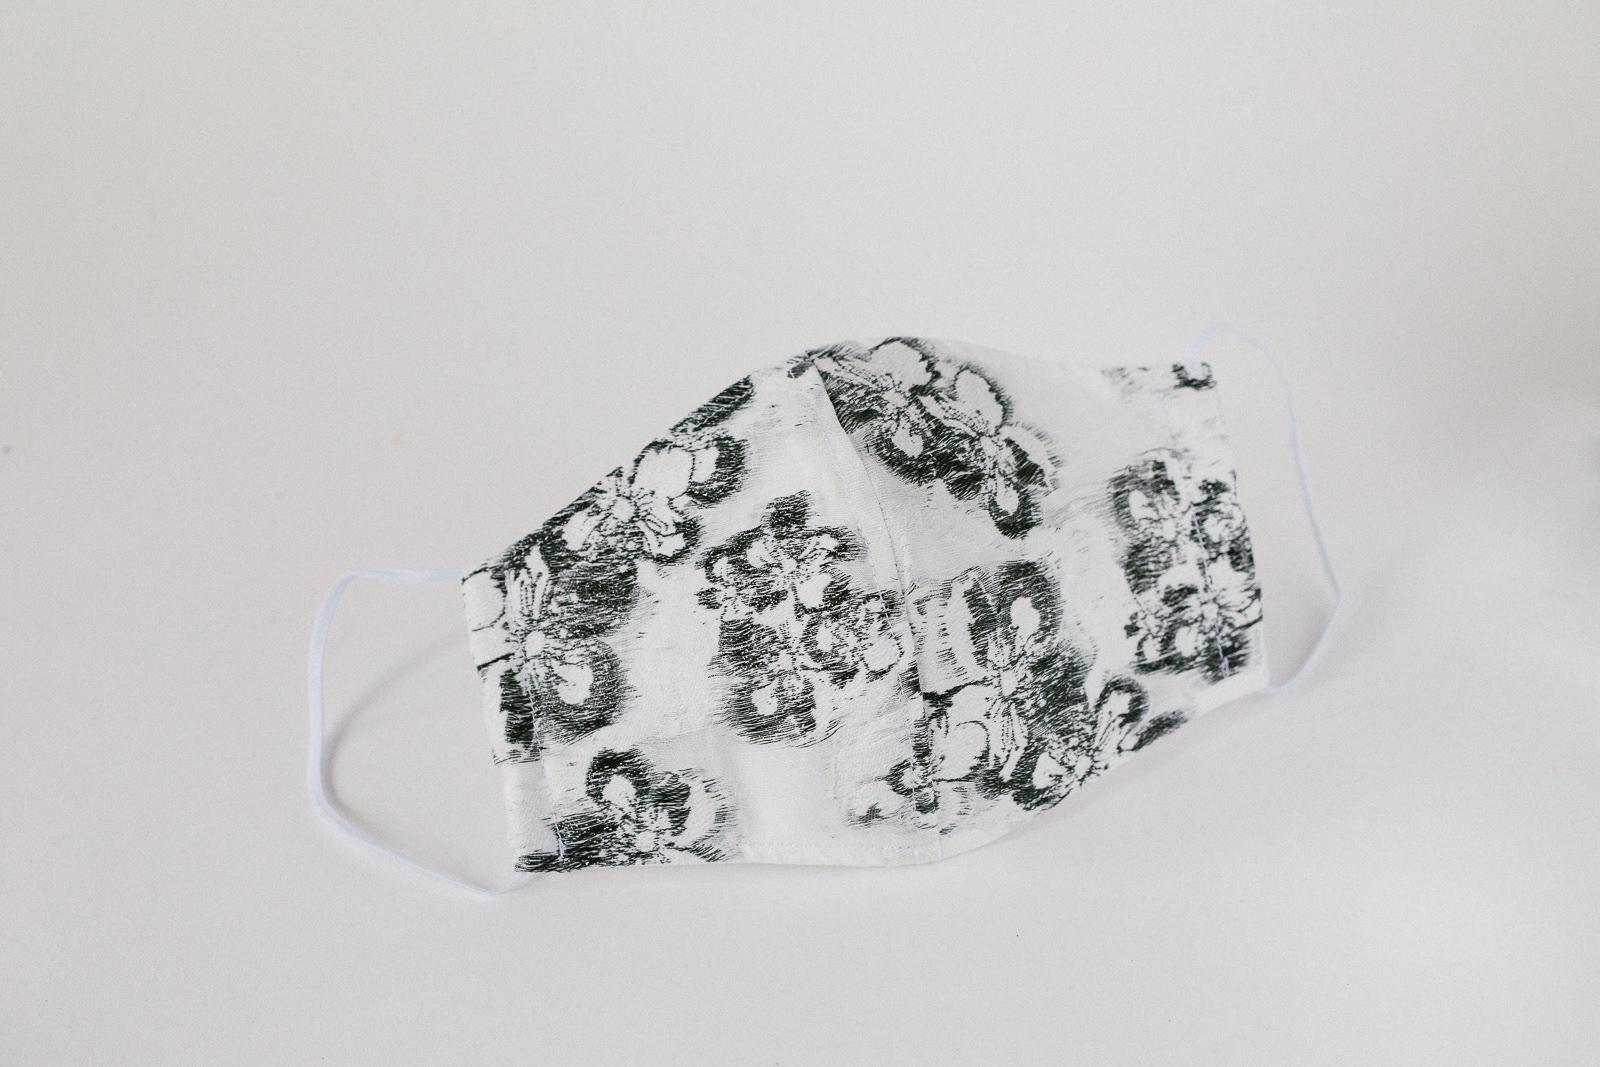 Handmade designer facemask - Melborune facemask - black and white